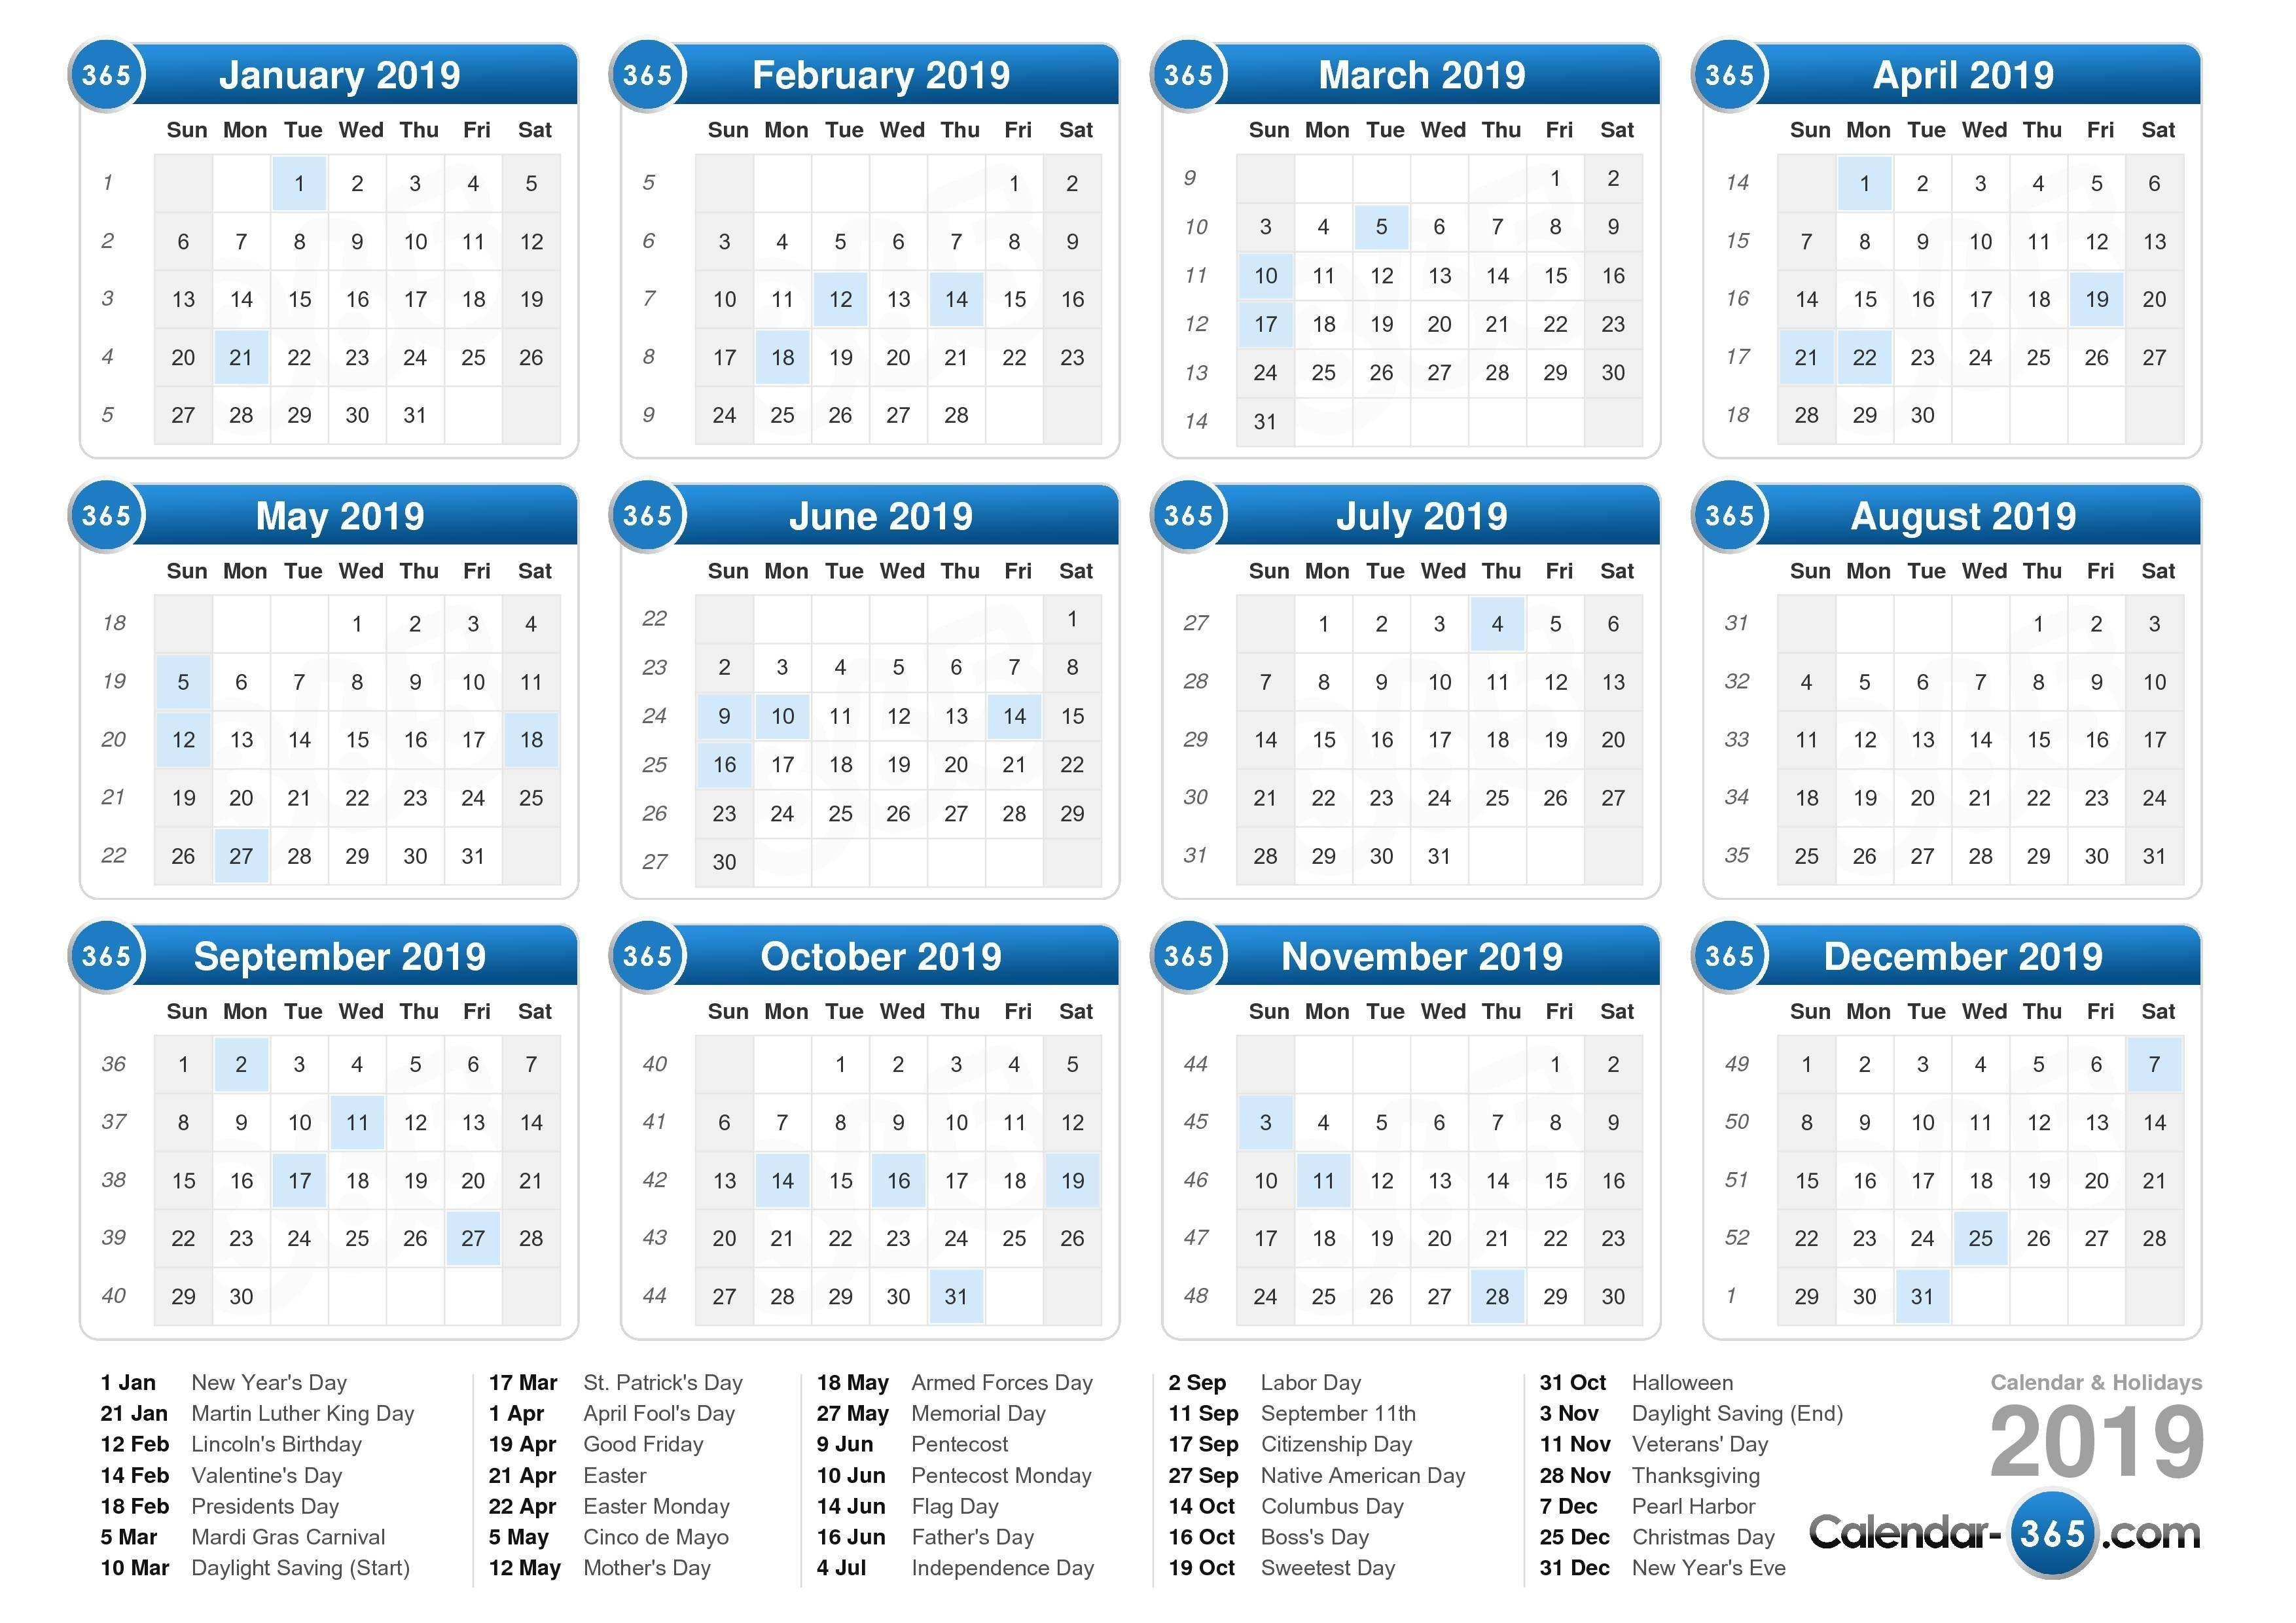 2019 Calendar Calendar 2019 Showing Holidays